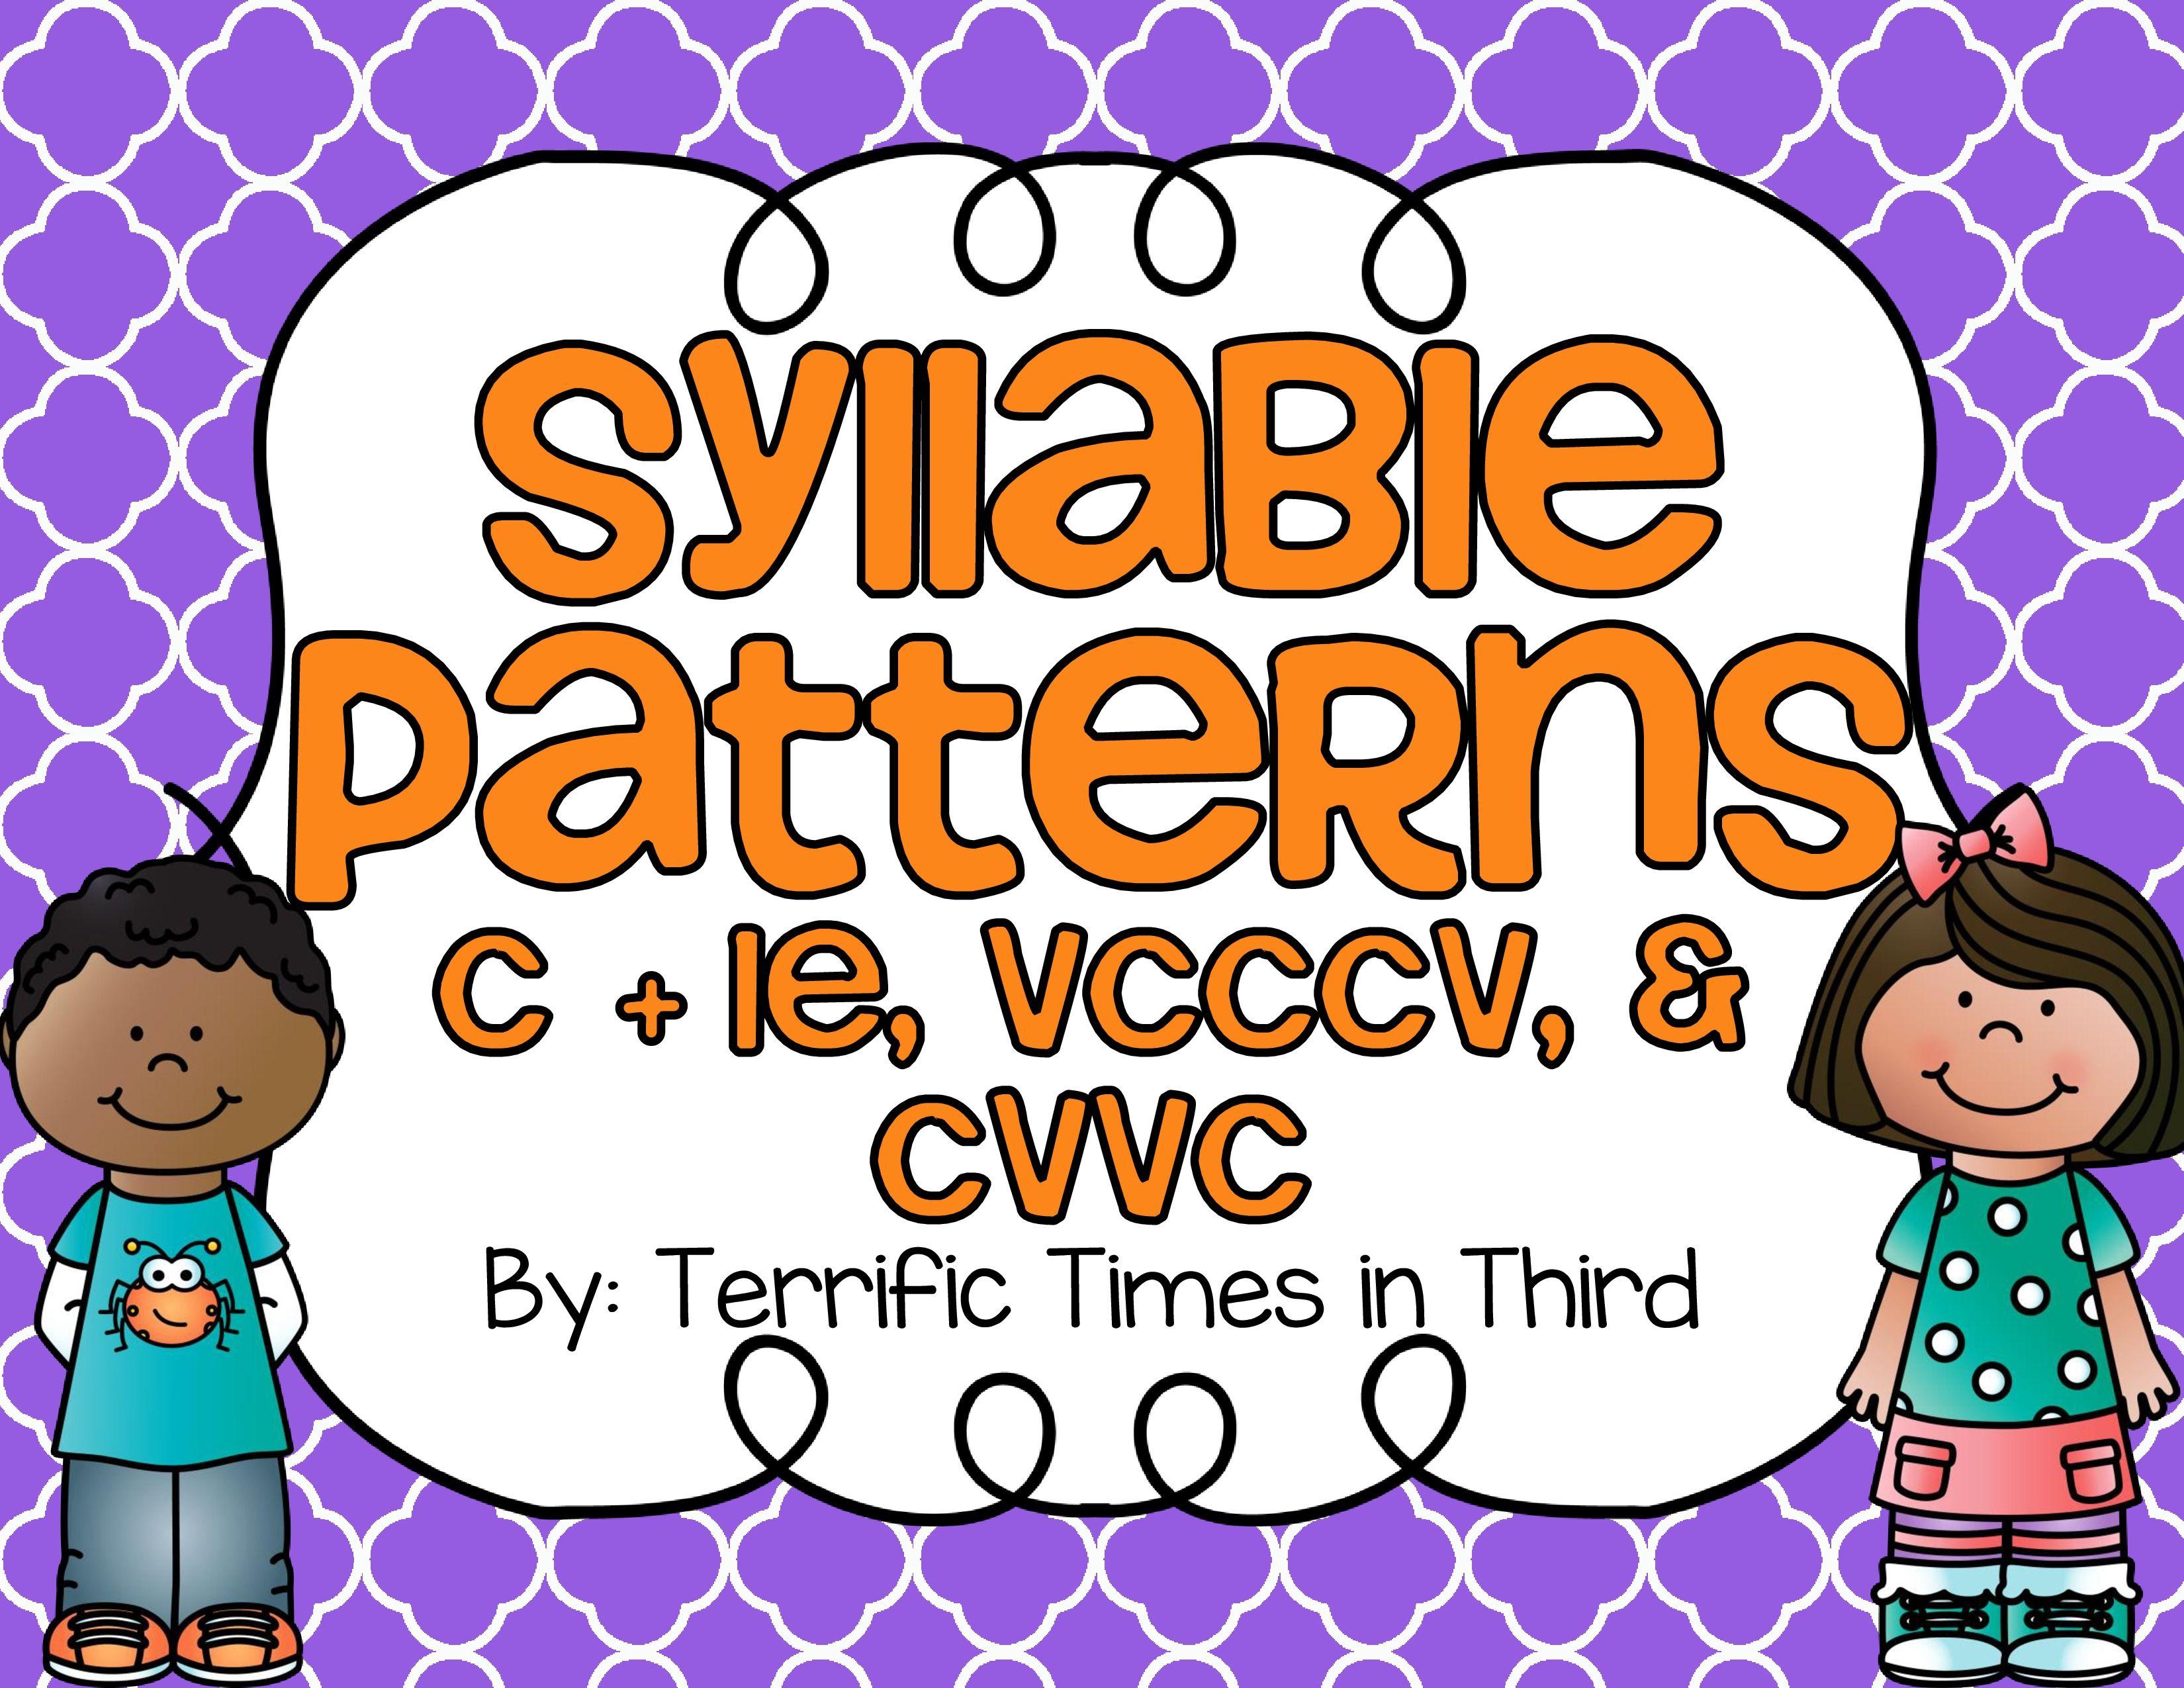 Syllable patterns vccv worksheet education com - Syllable Patterns C Le Vcccv And Cvvc No Prep Worksheets